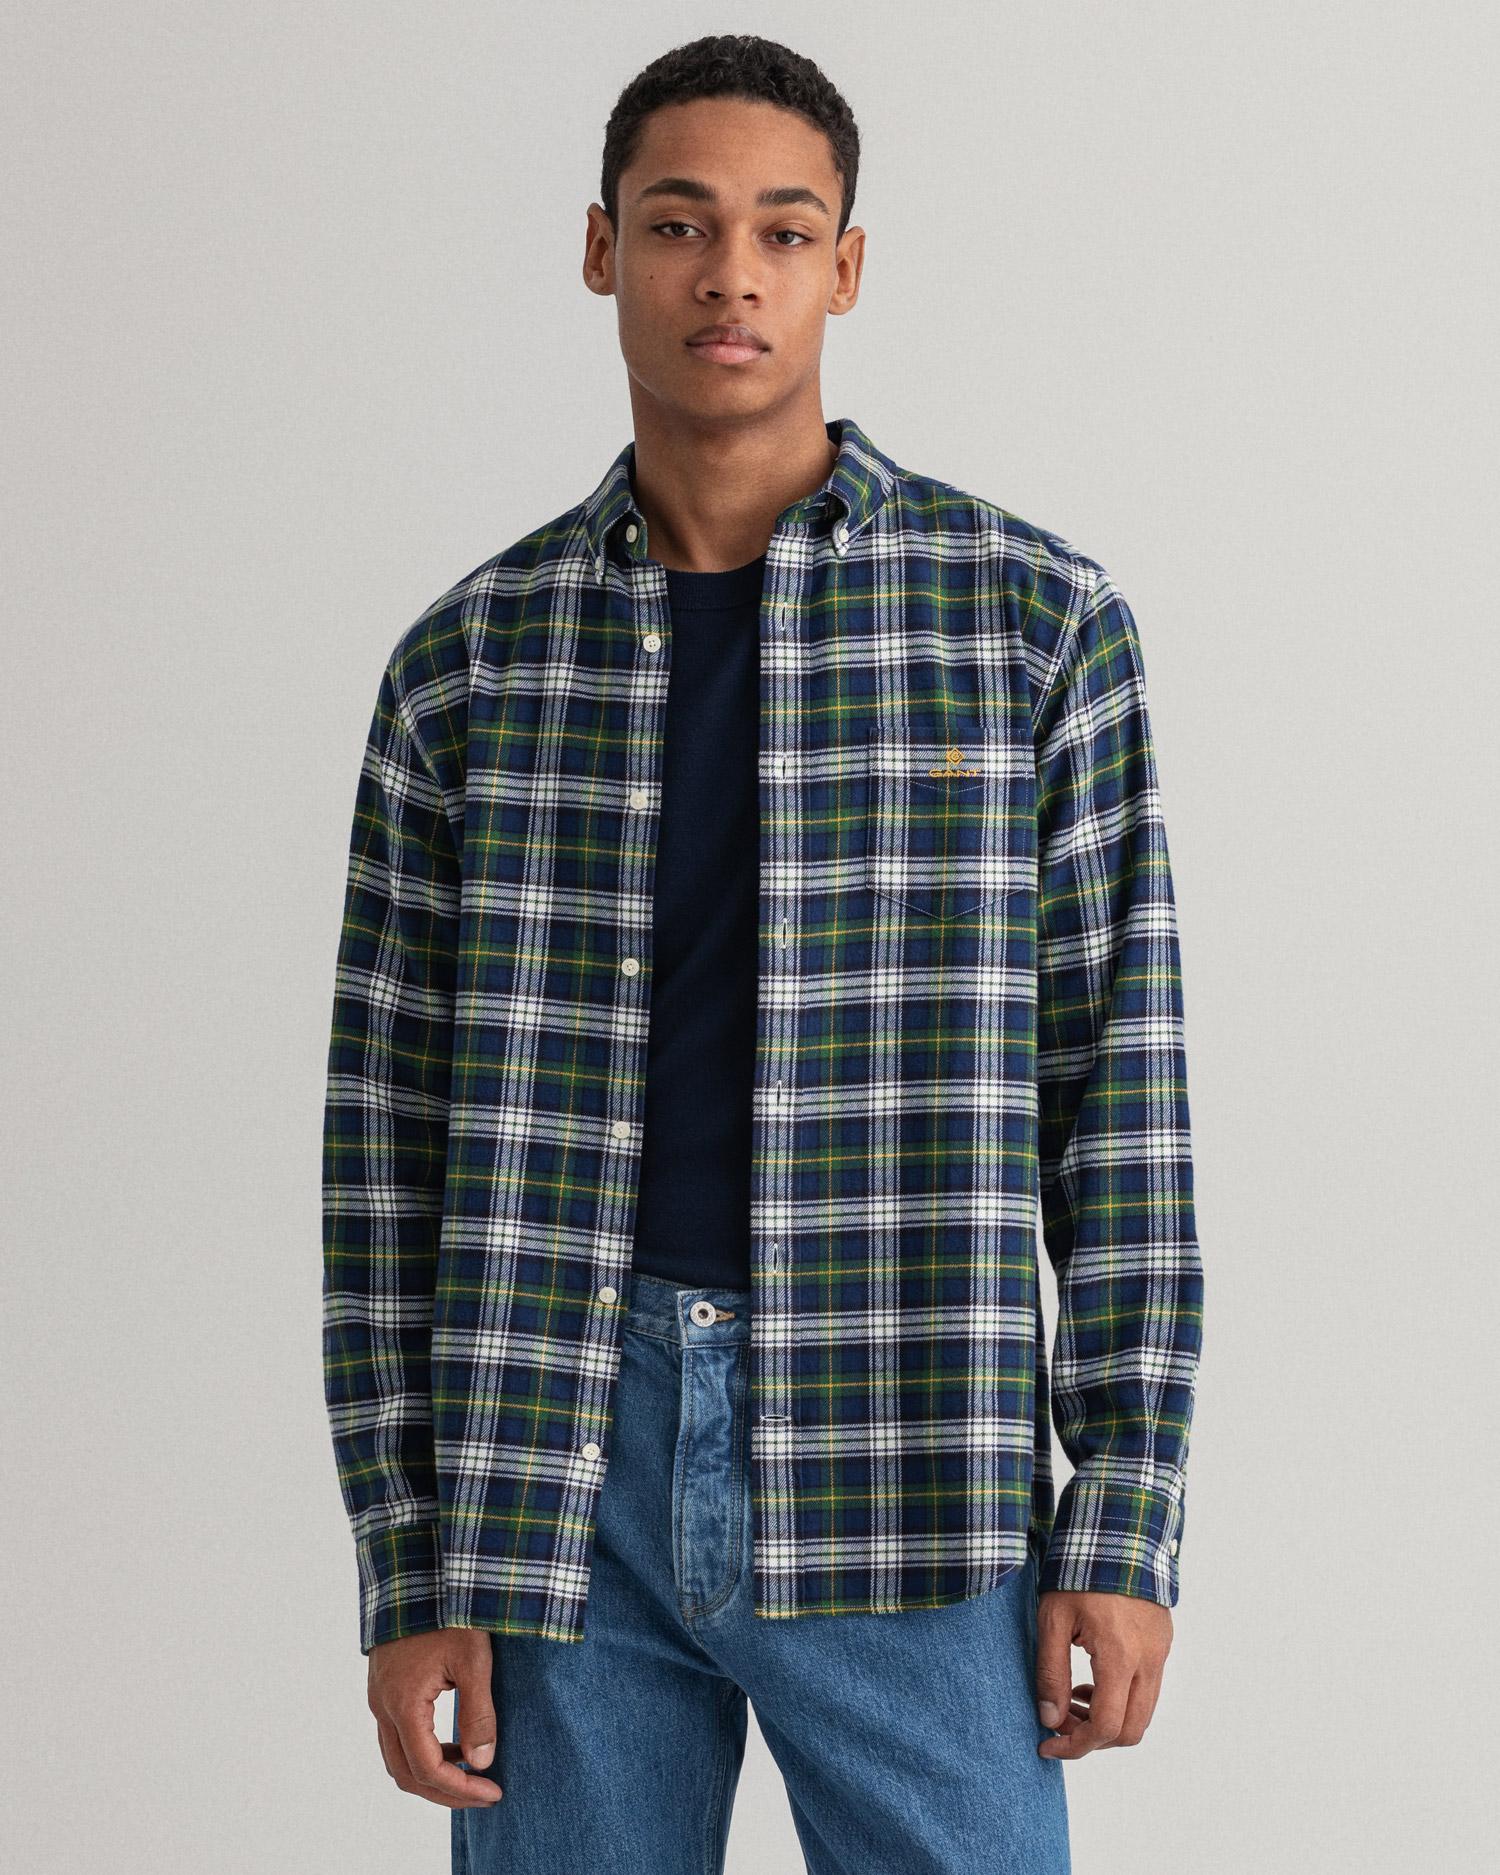 GANT męska koszula flanelowa w kratkę Regular Fit  - 3015370